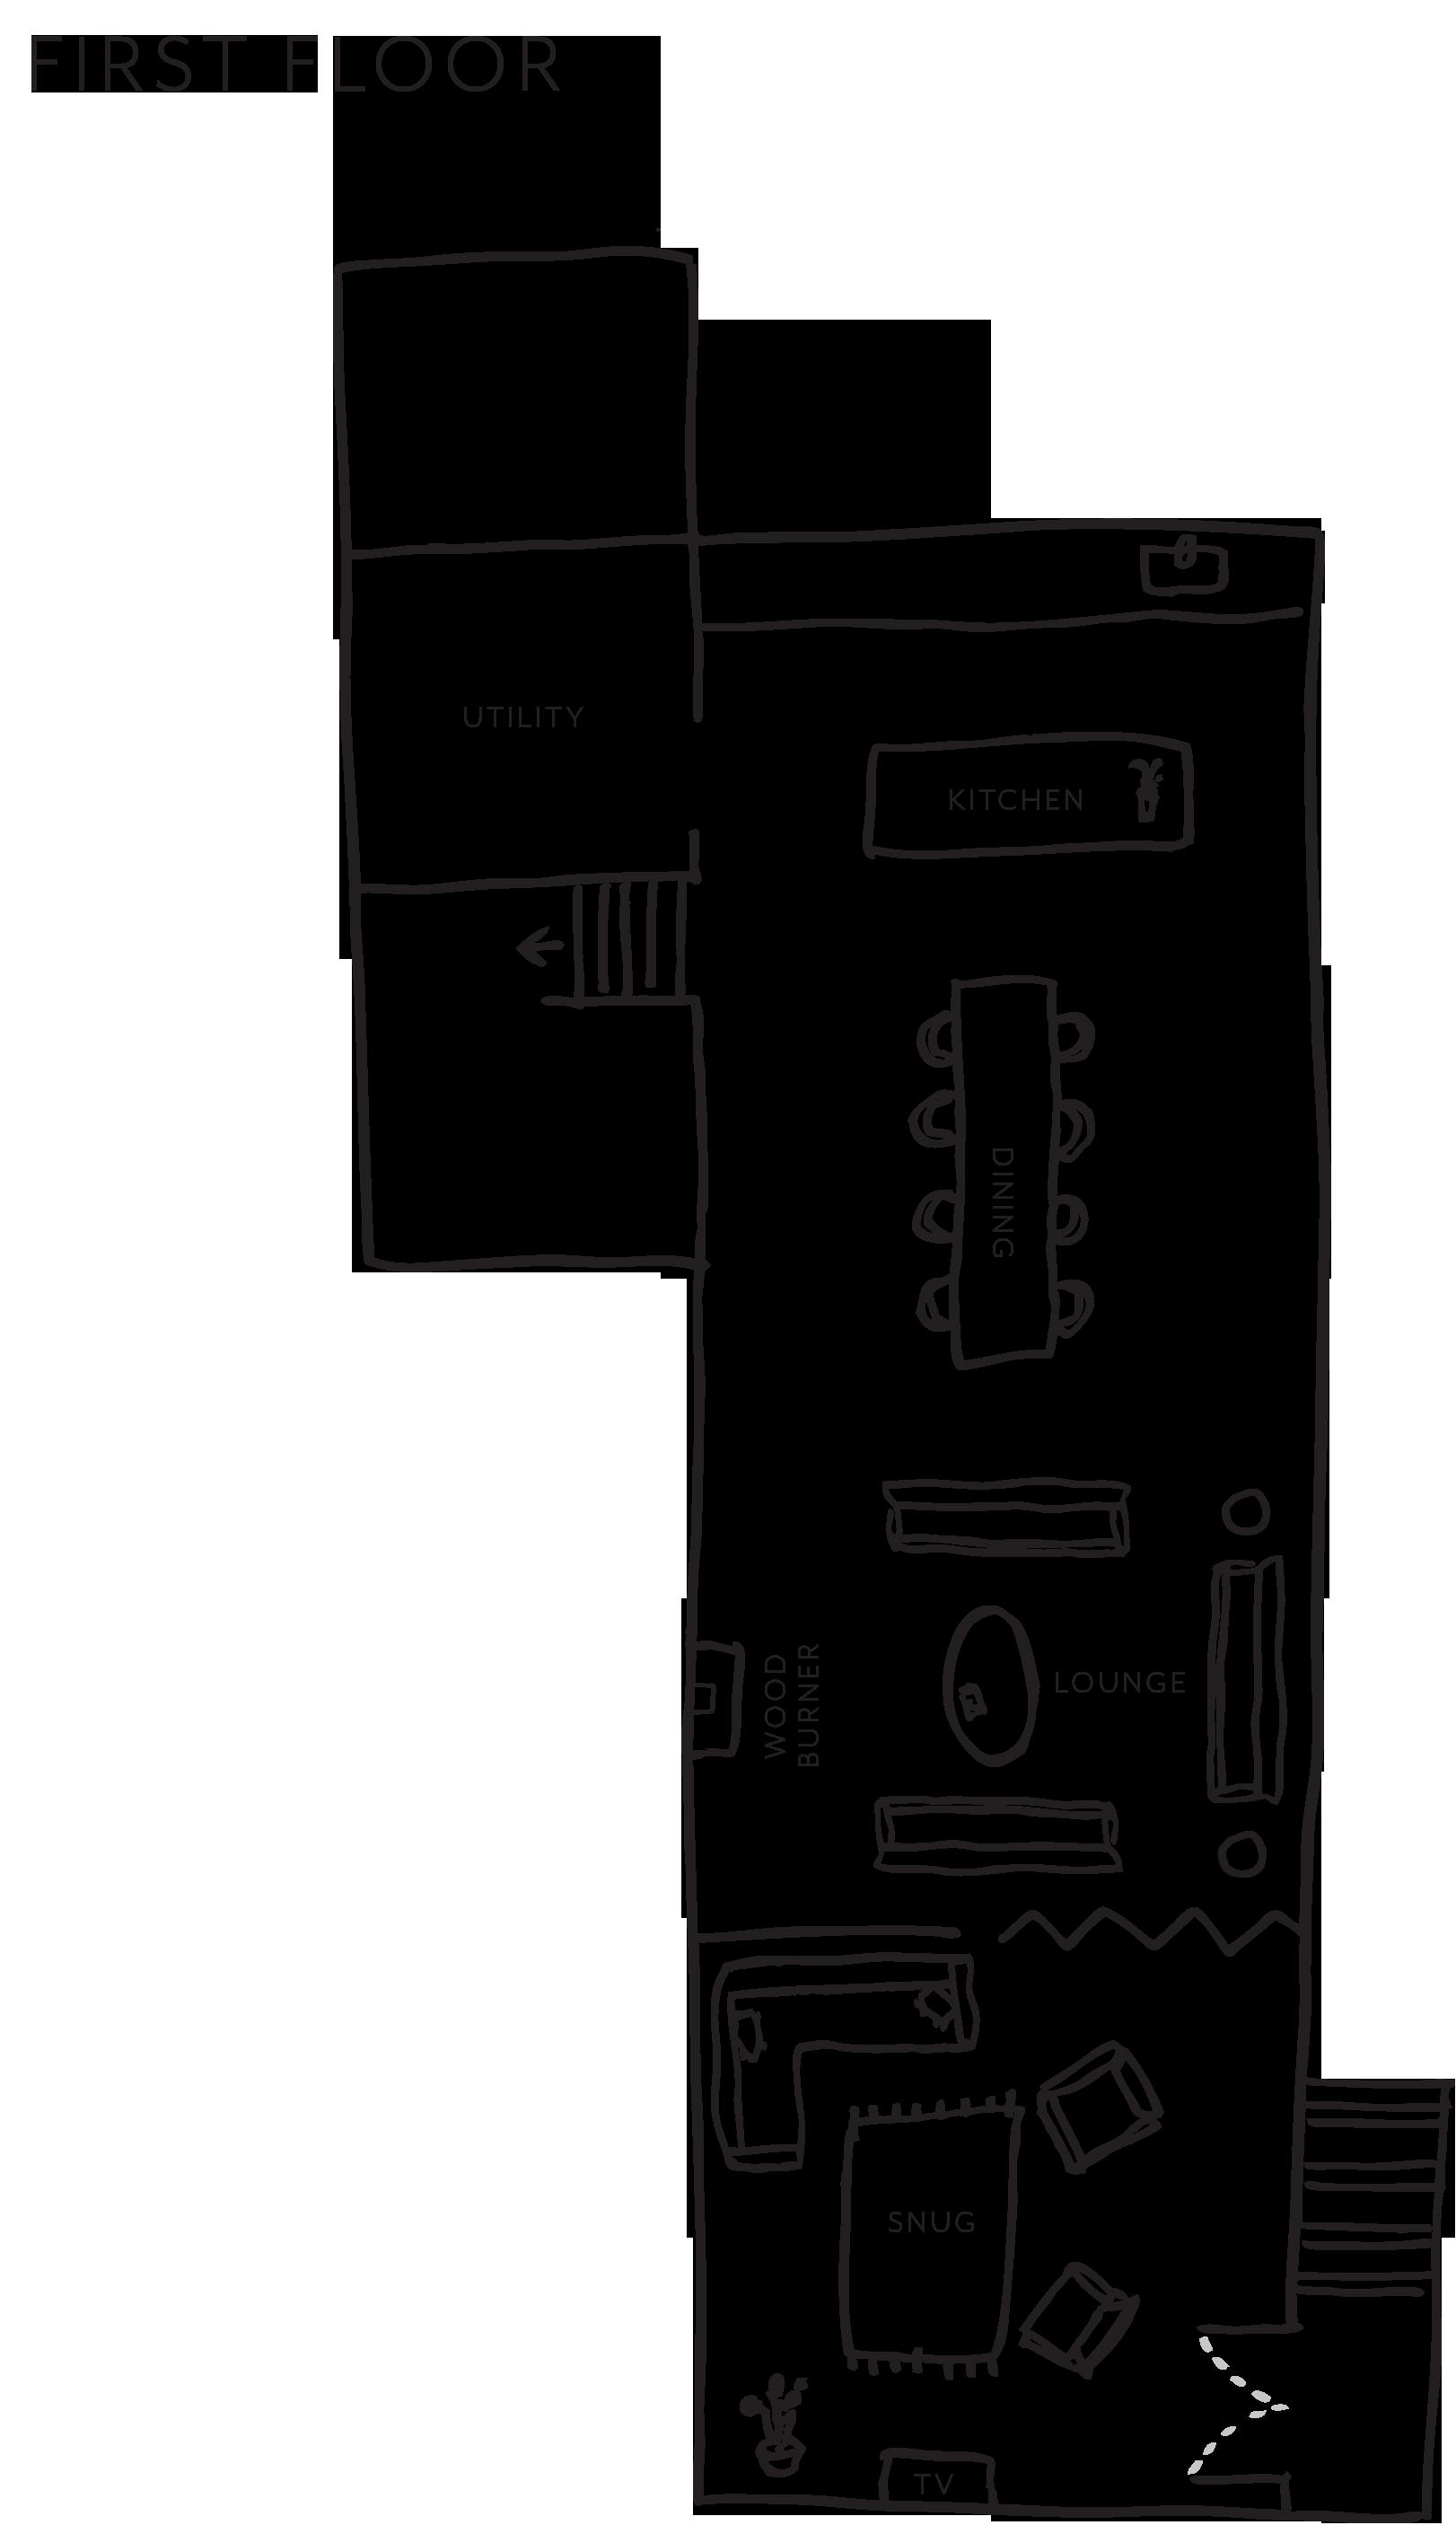 WR-Floor-Plans-2.png